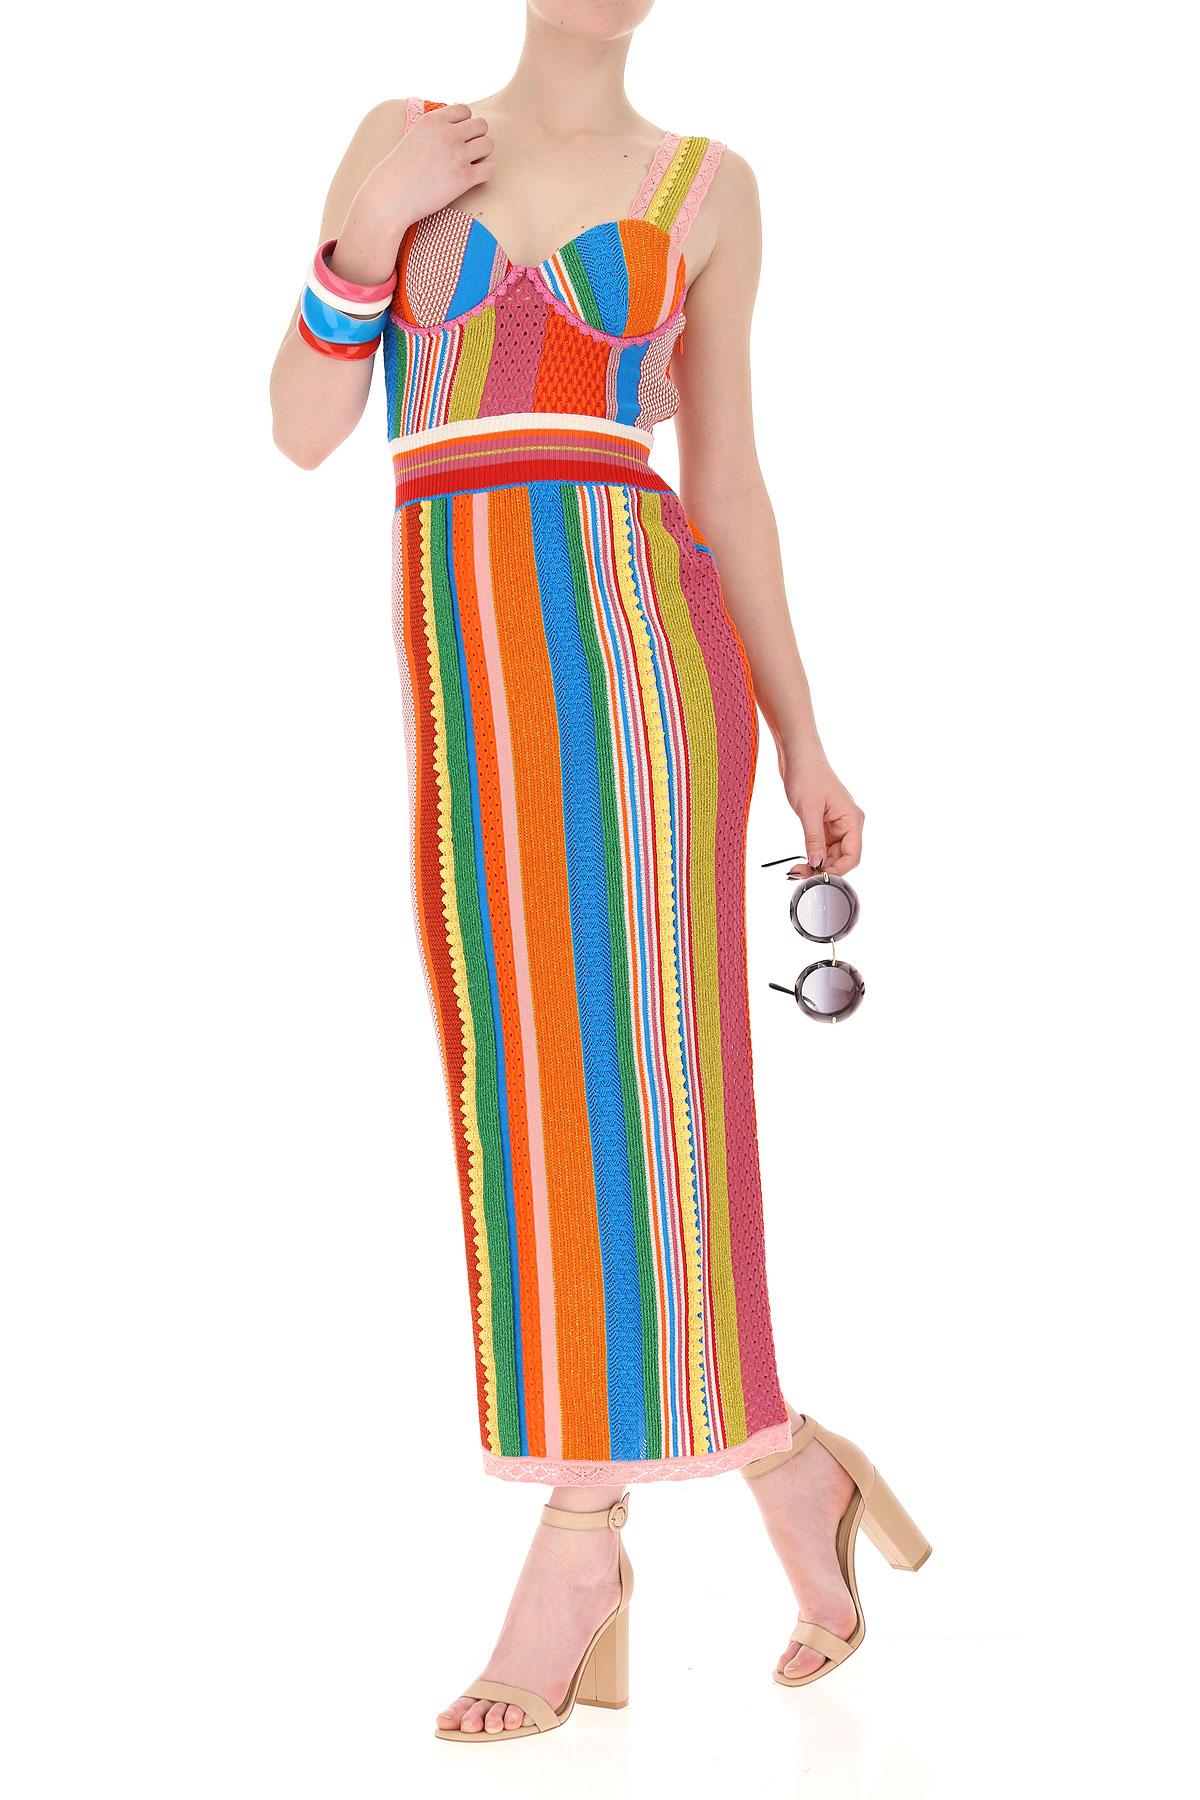 verano Primavera Multicolor 2019 Ropa Mujer Para Moschino nbsp; qIxtR16w